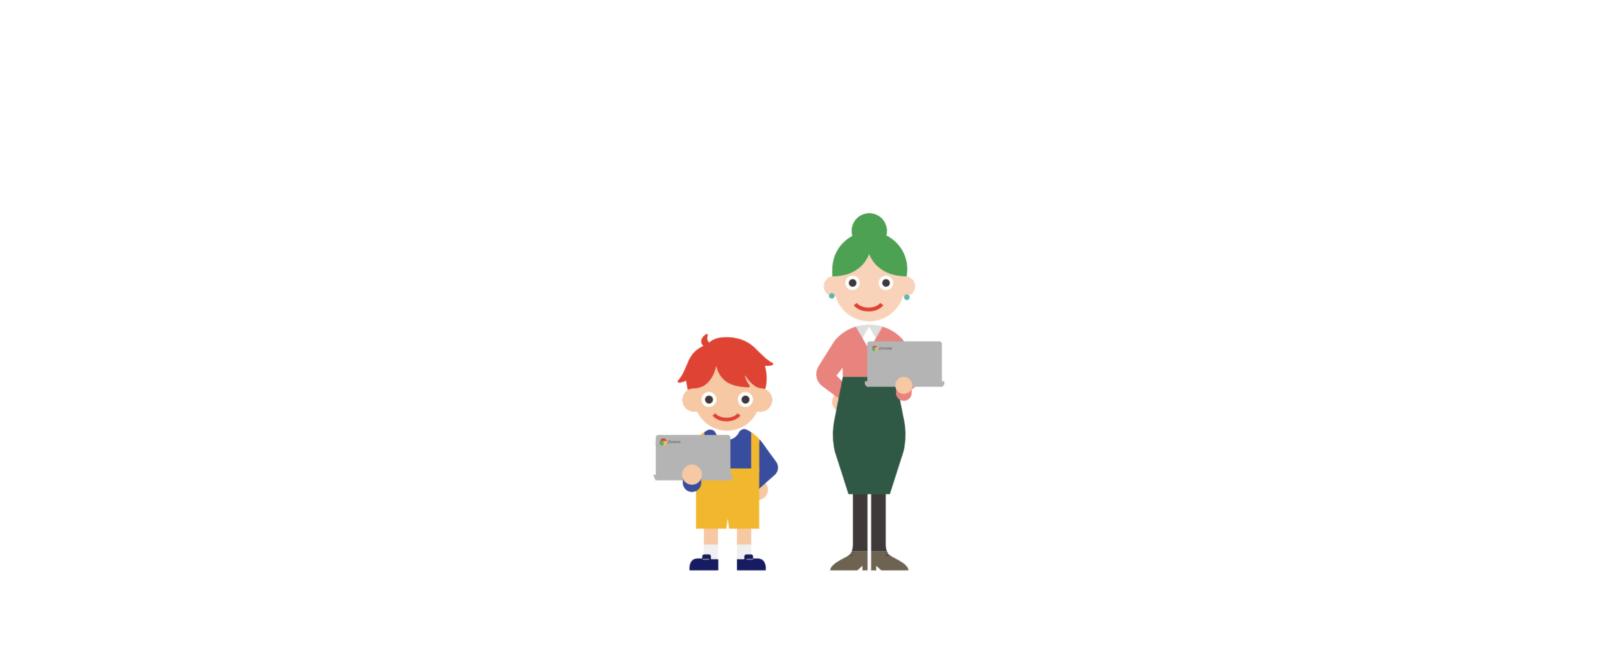 [Google for Education] GIGA スクール構想実現に向けたオンラインセミナー 〜静岡市実証プロジェクトから学ぶ導入初期の学校内外における利活用〜